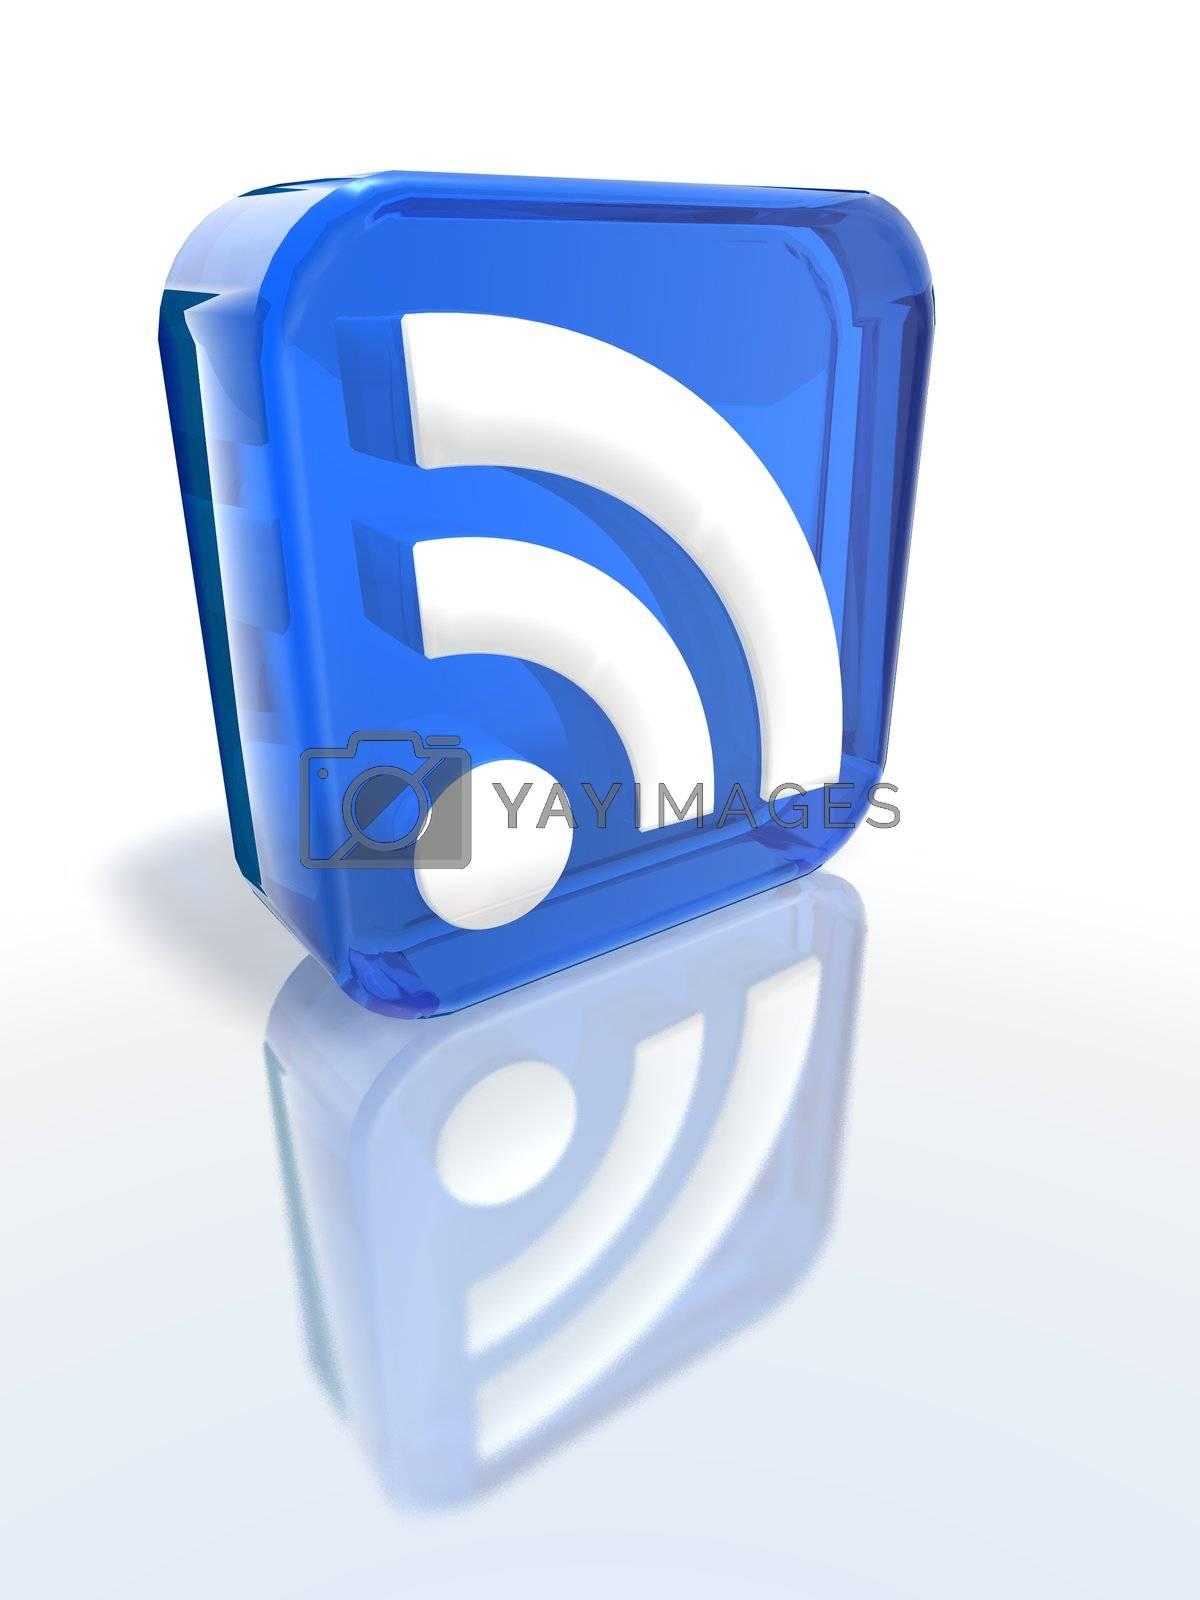 a 3d render of a blue RSS sign